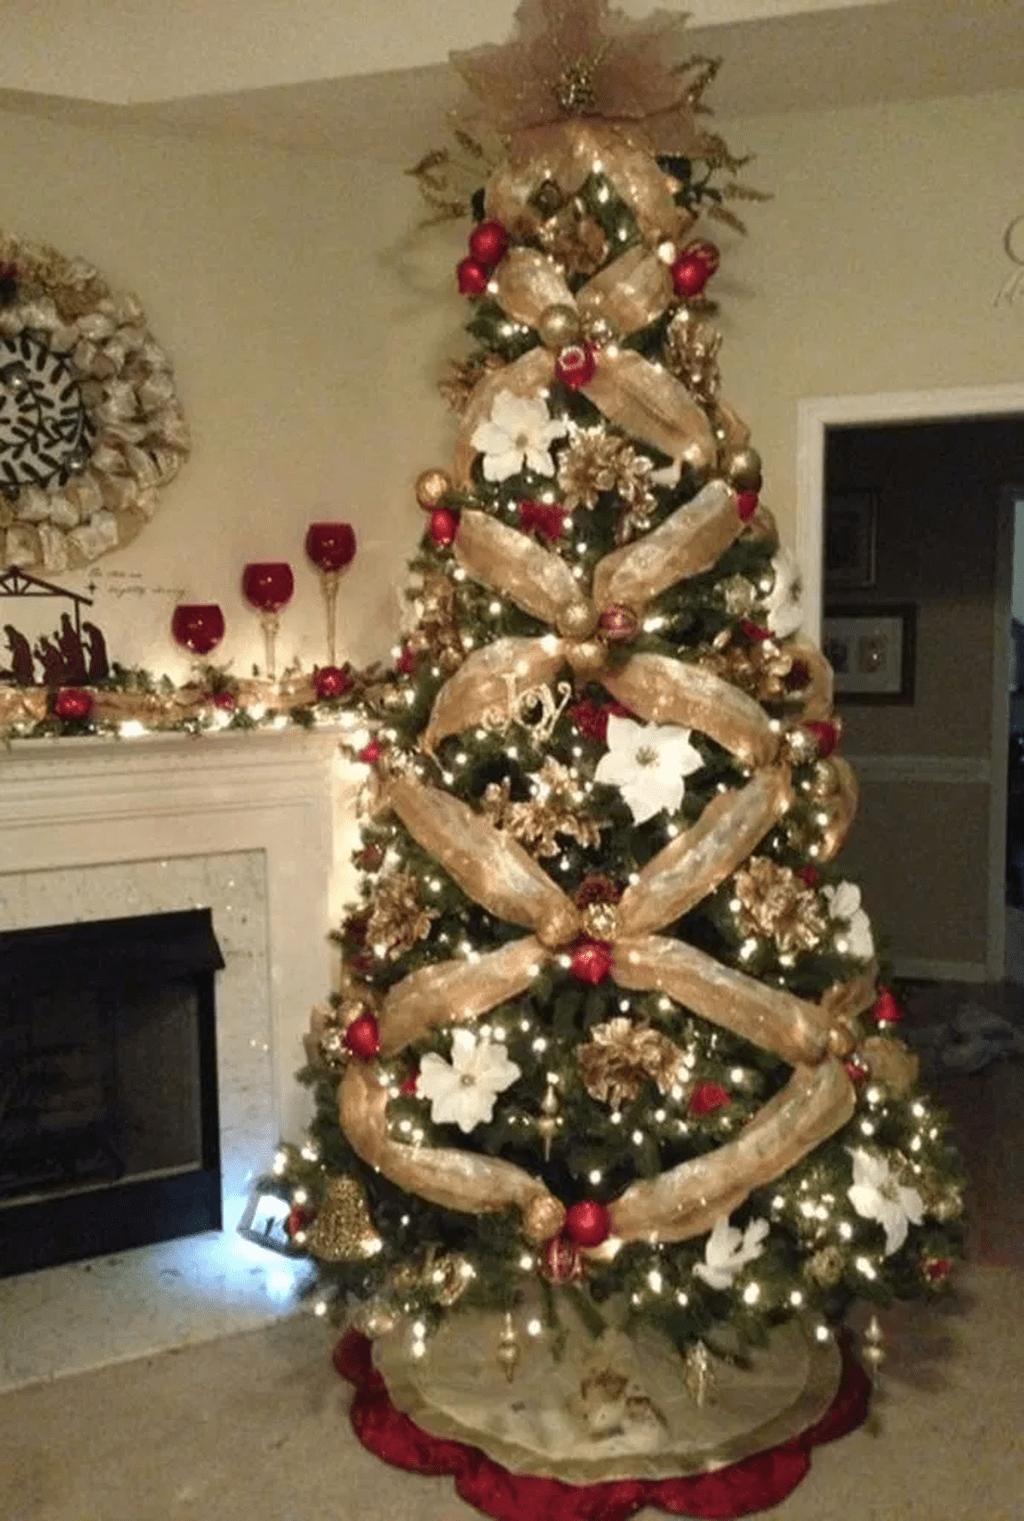 34 Beautiful Christmas Tree Decorations Ideas Elegant Christmas Trees Christmas Tree Decorations Diy Christmas Tree Decorations